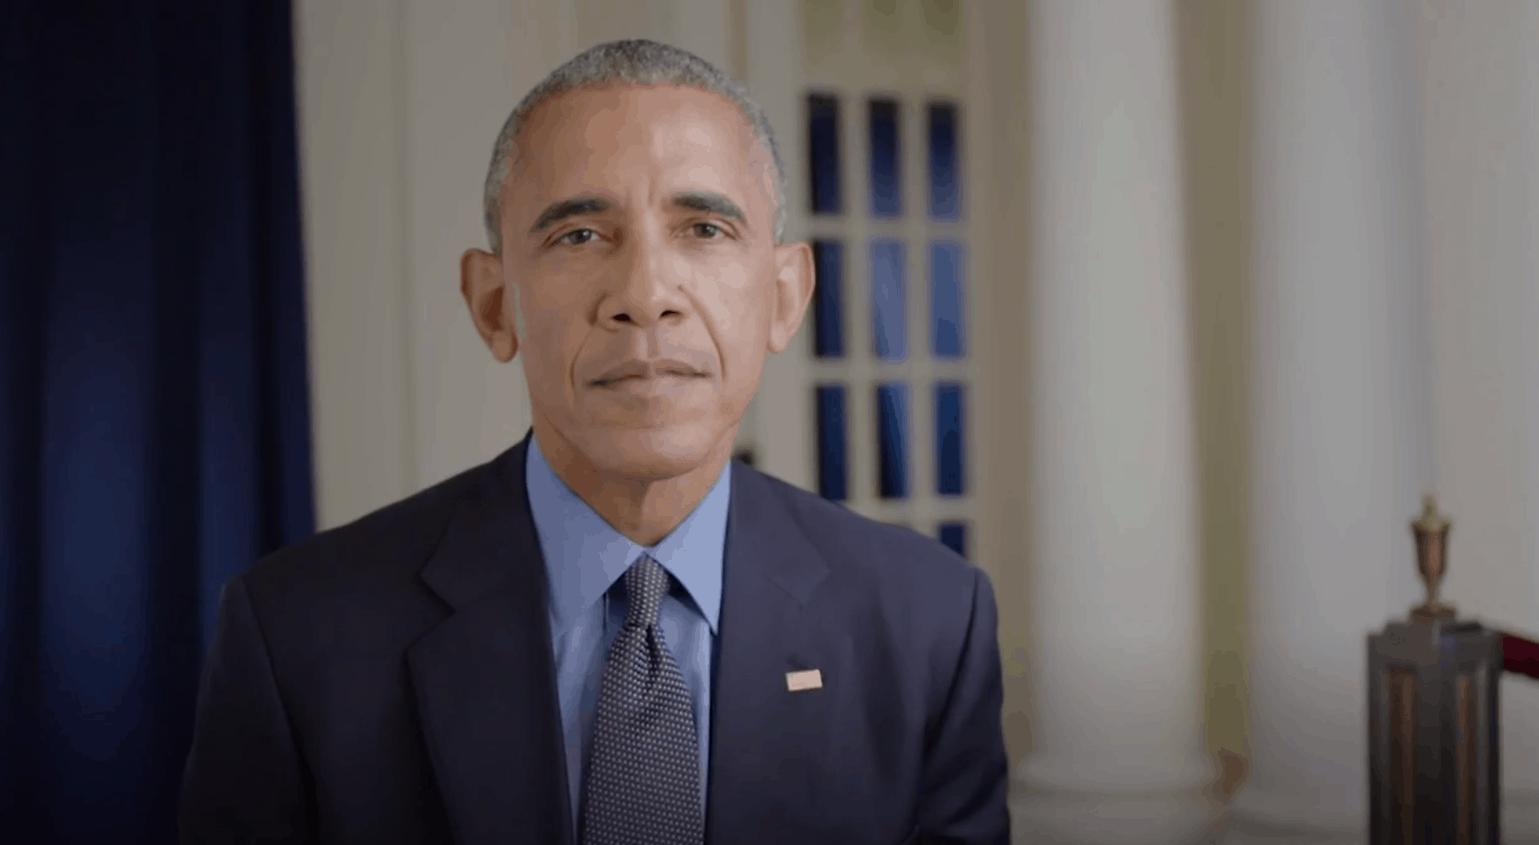 Barack Obama chambre les Warriors lors de la visite des Cavs